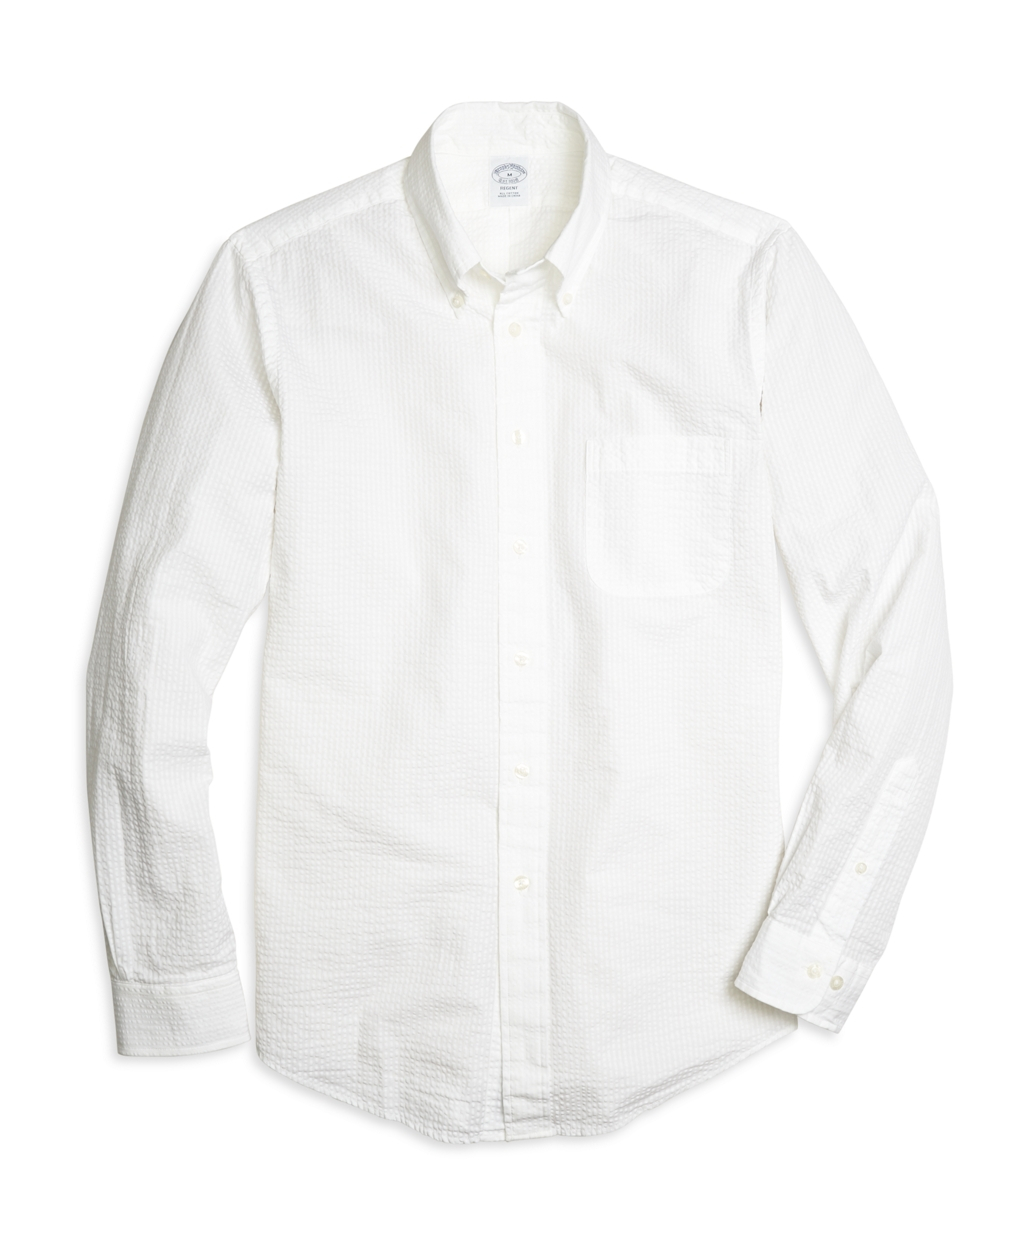 Brooks brothers regent fit seersucker stripe sport shirt Brooks brothers shirt size guide